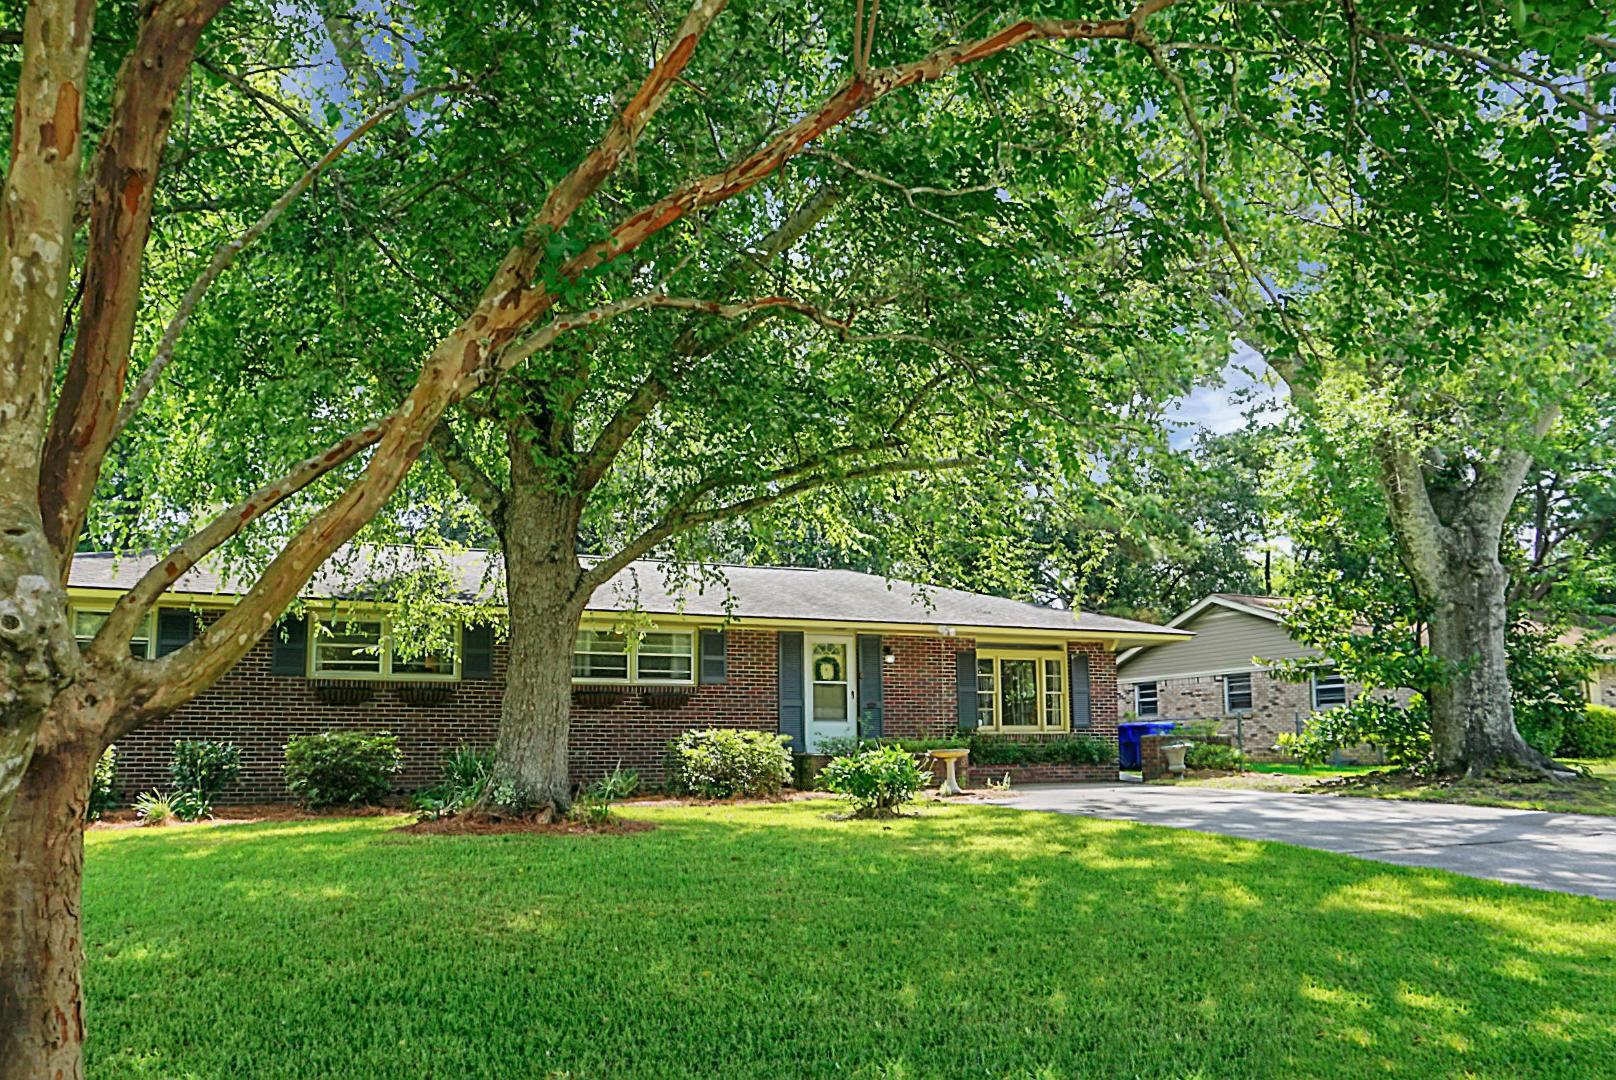 Oakland Homes For Sale - 408 Arlington, Charleston, SC - 15